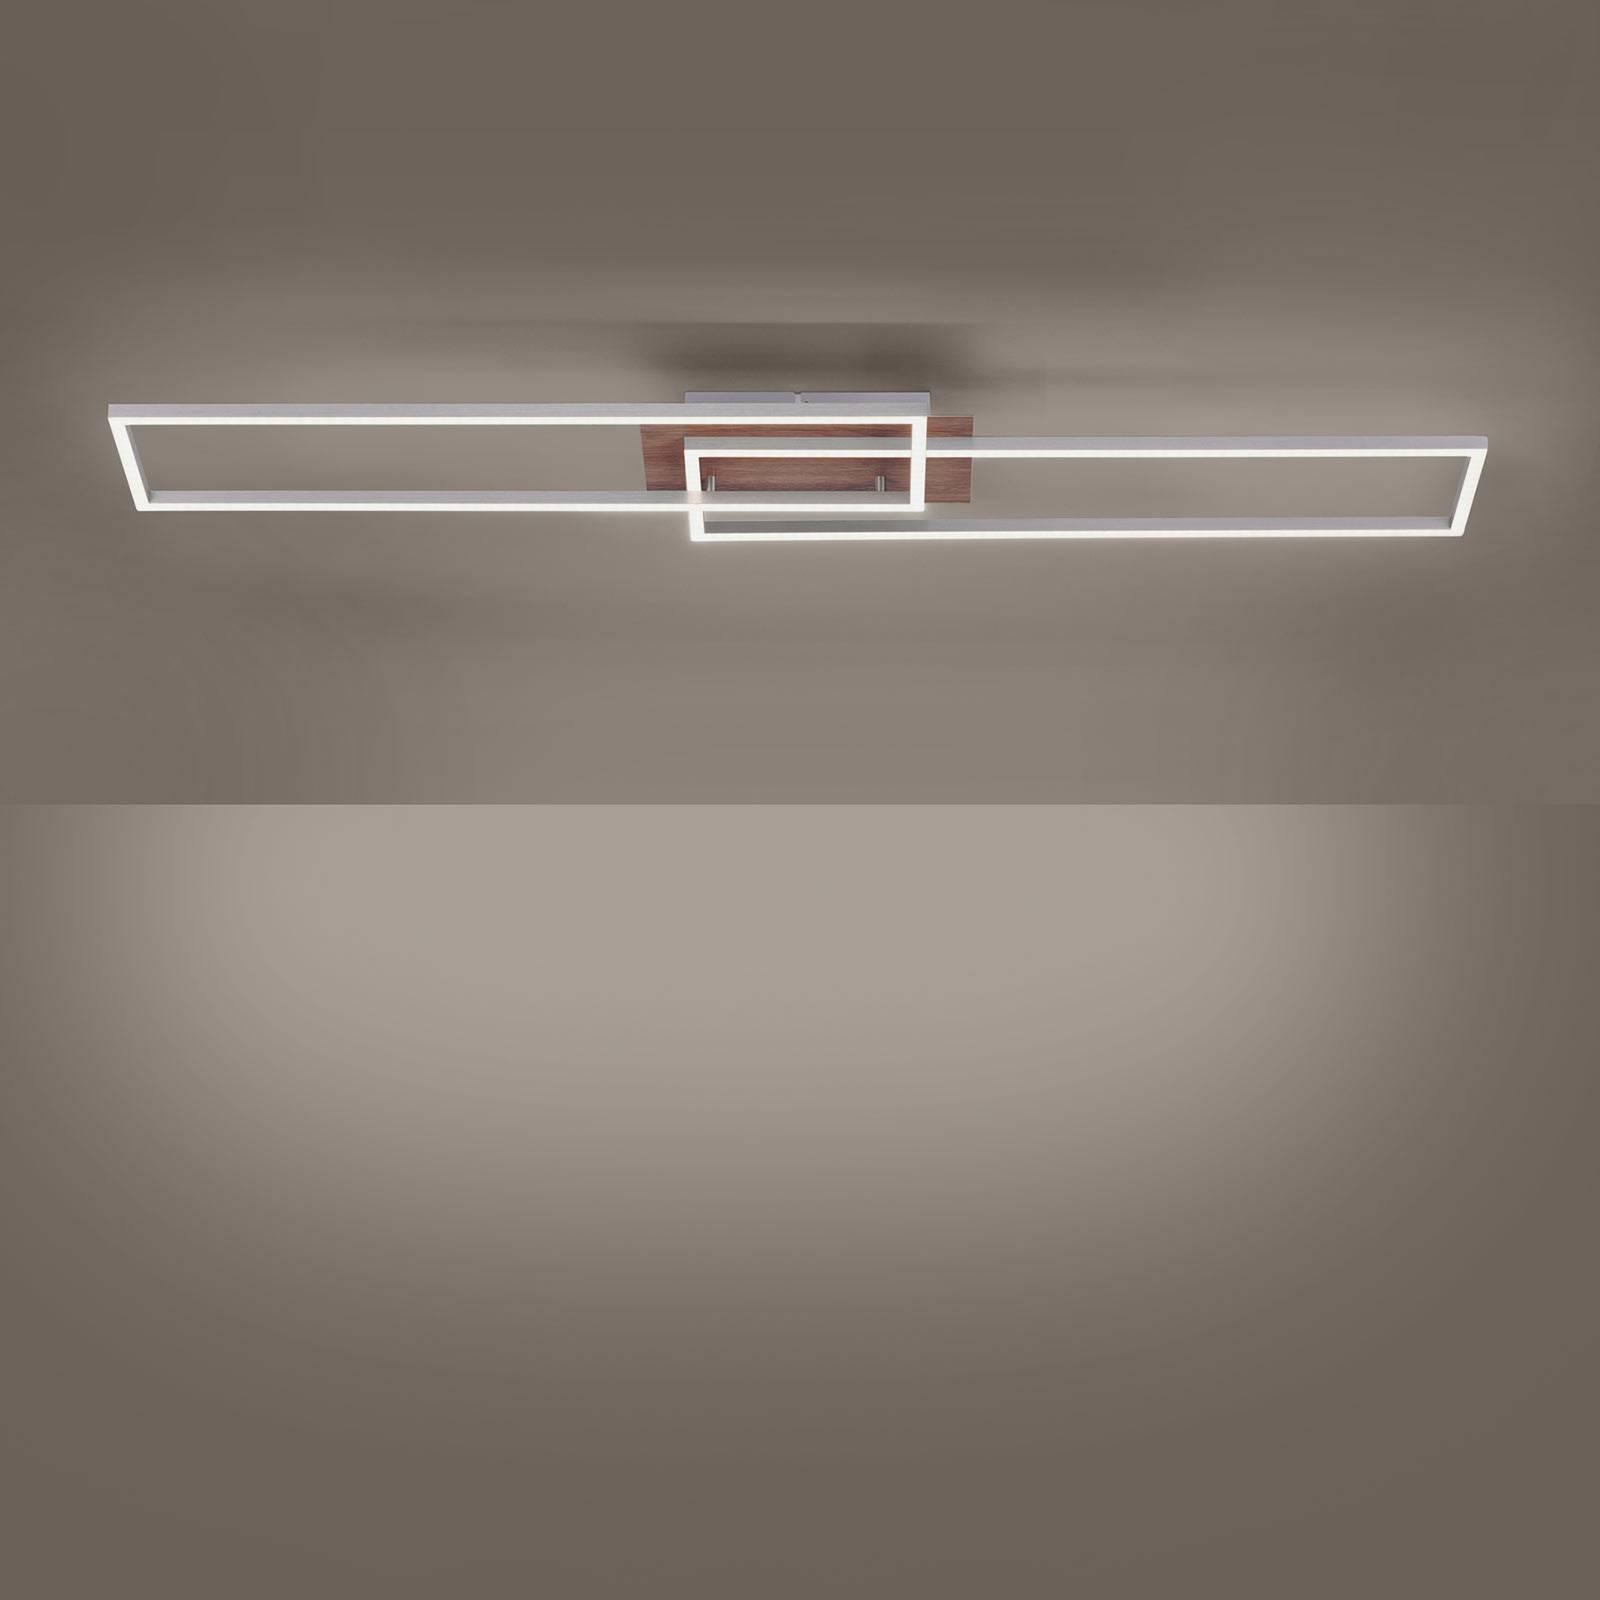 LED plafondlamp Iven houtdecor/staal 2-la.-rechth.